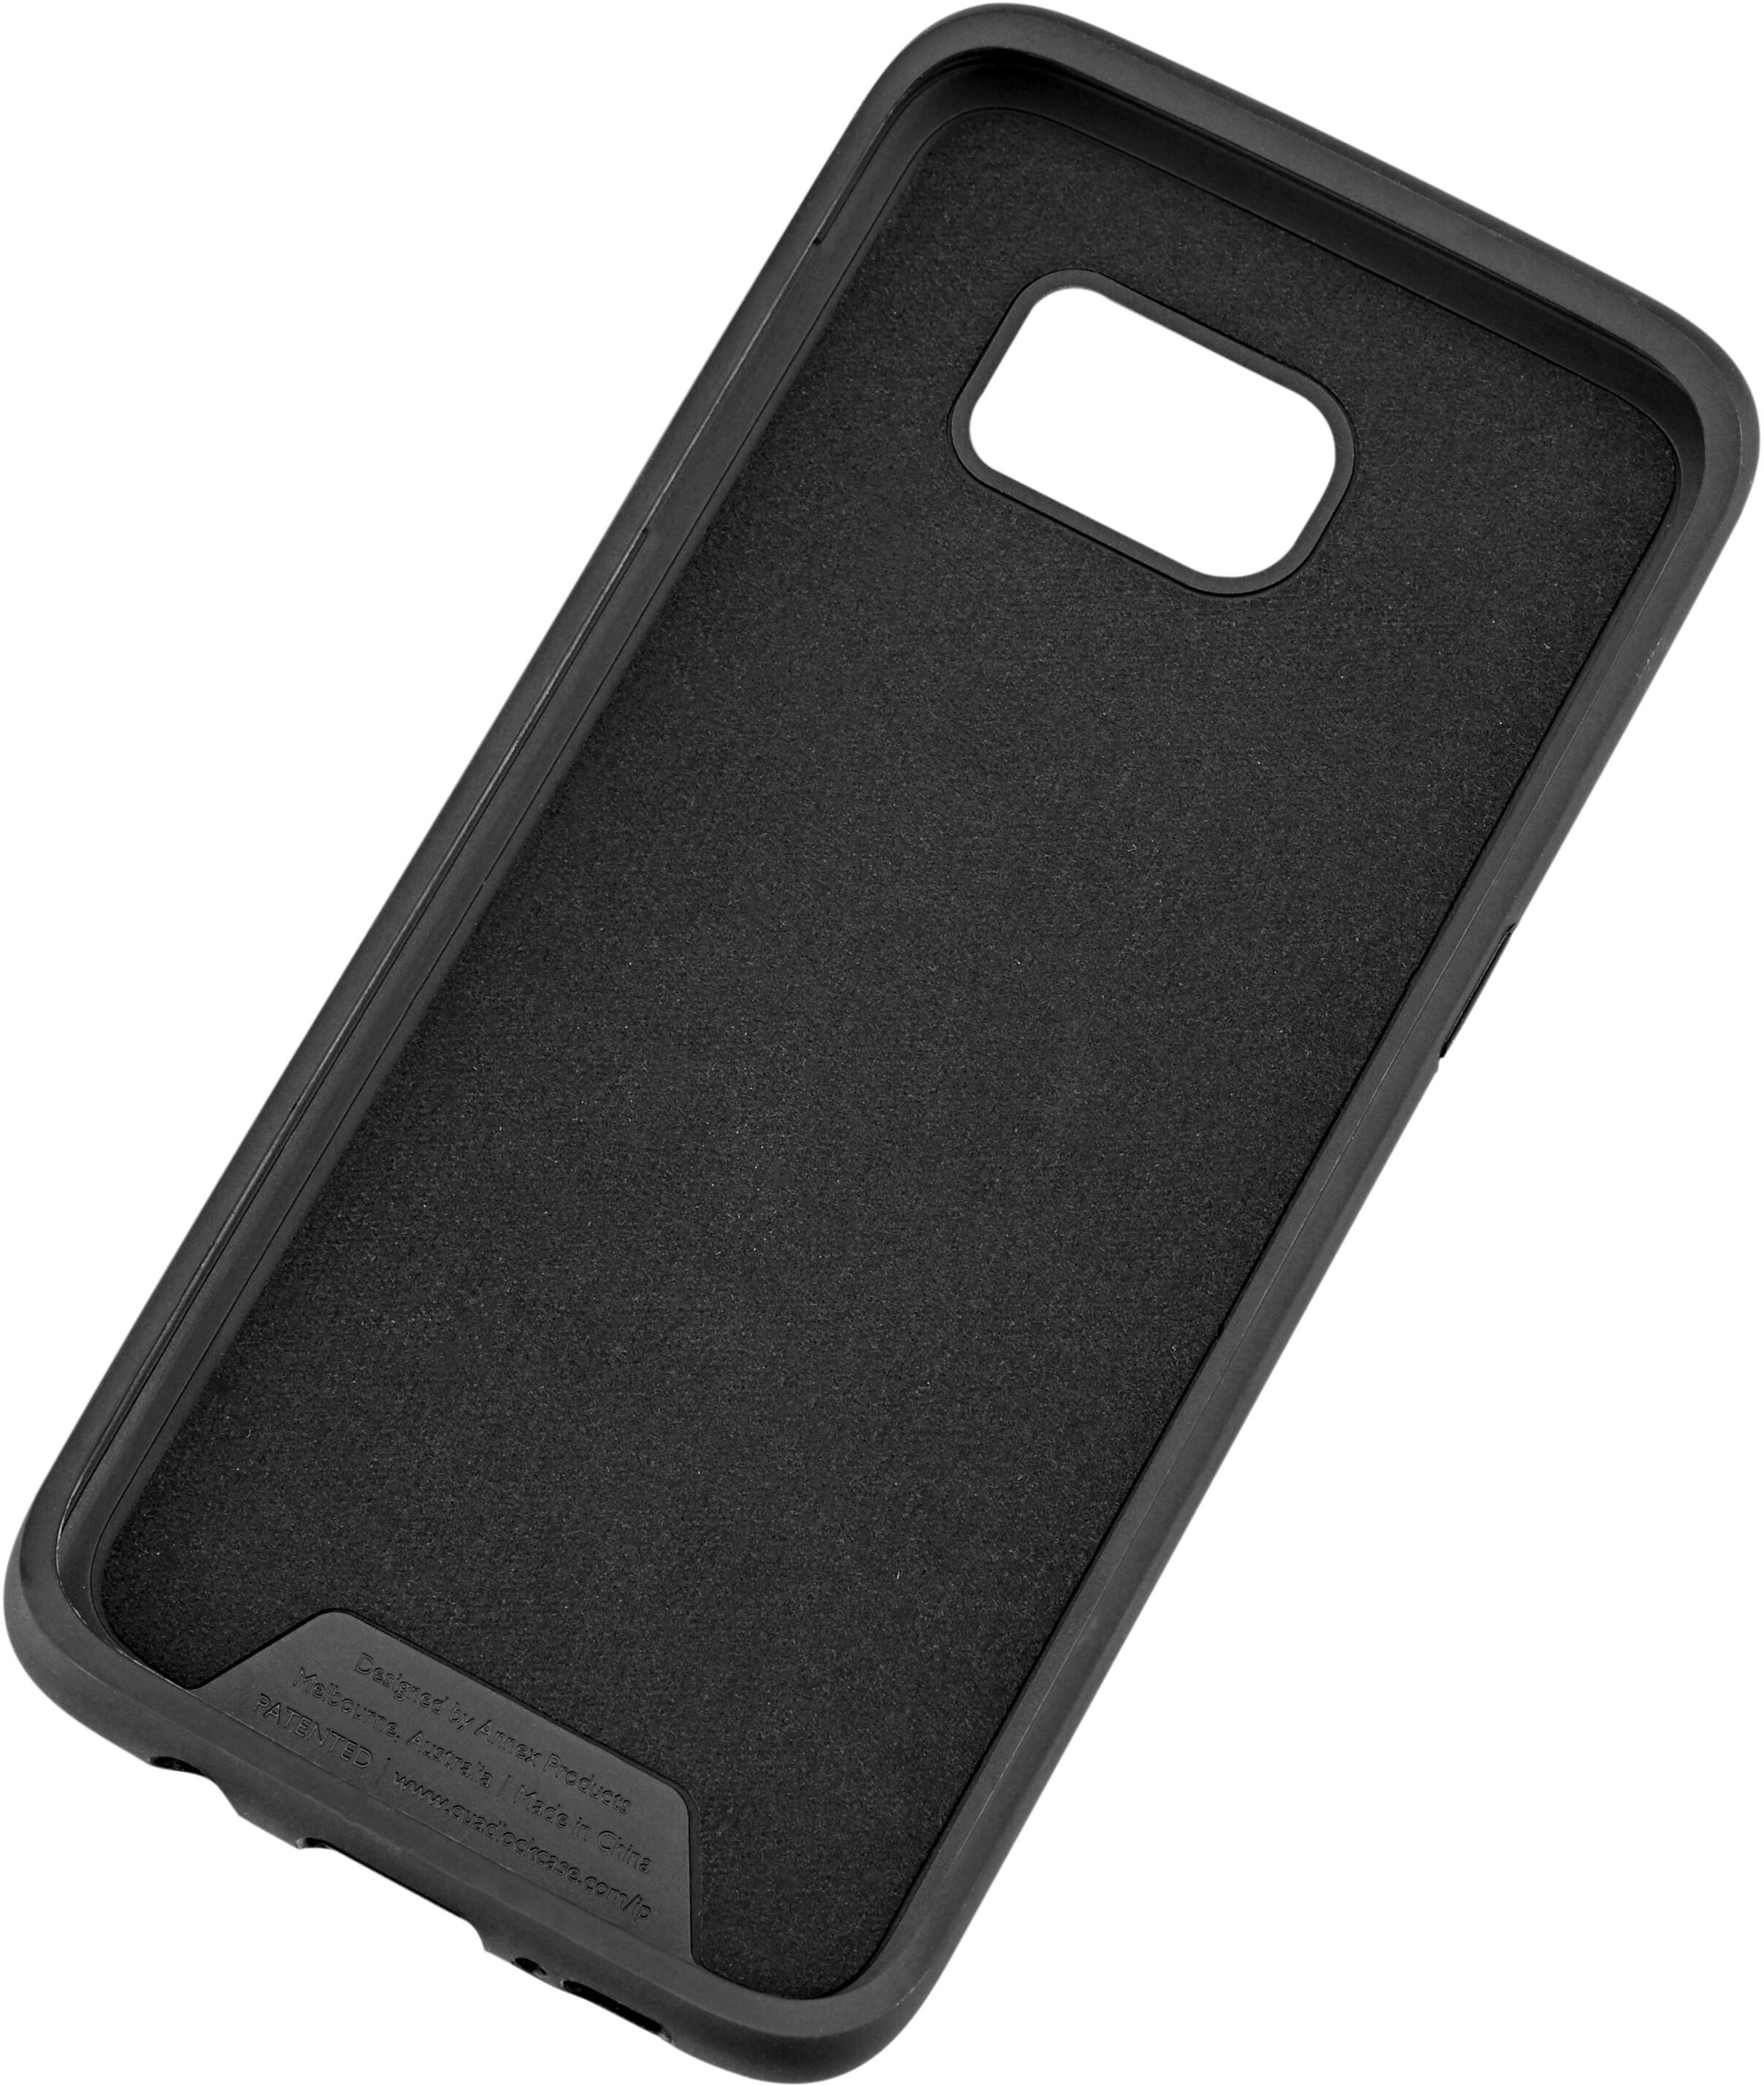 check out ee8a0 1fc07 Quad Lock Case Samsung Galaxy S7 Edge svart